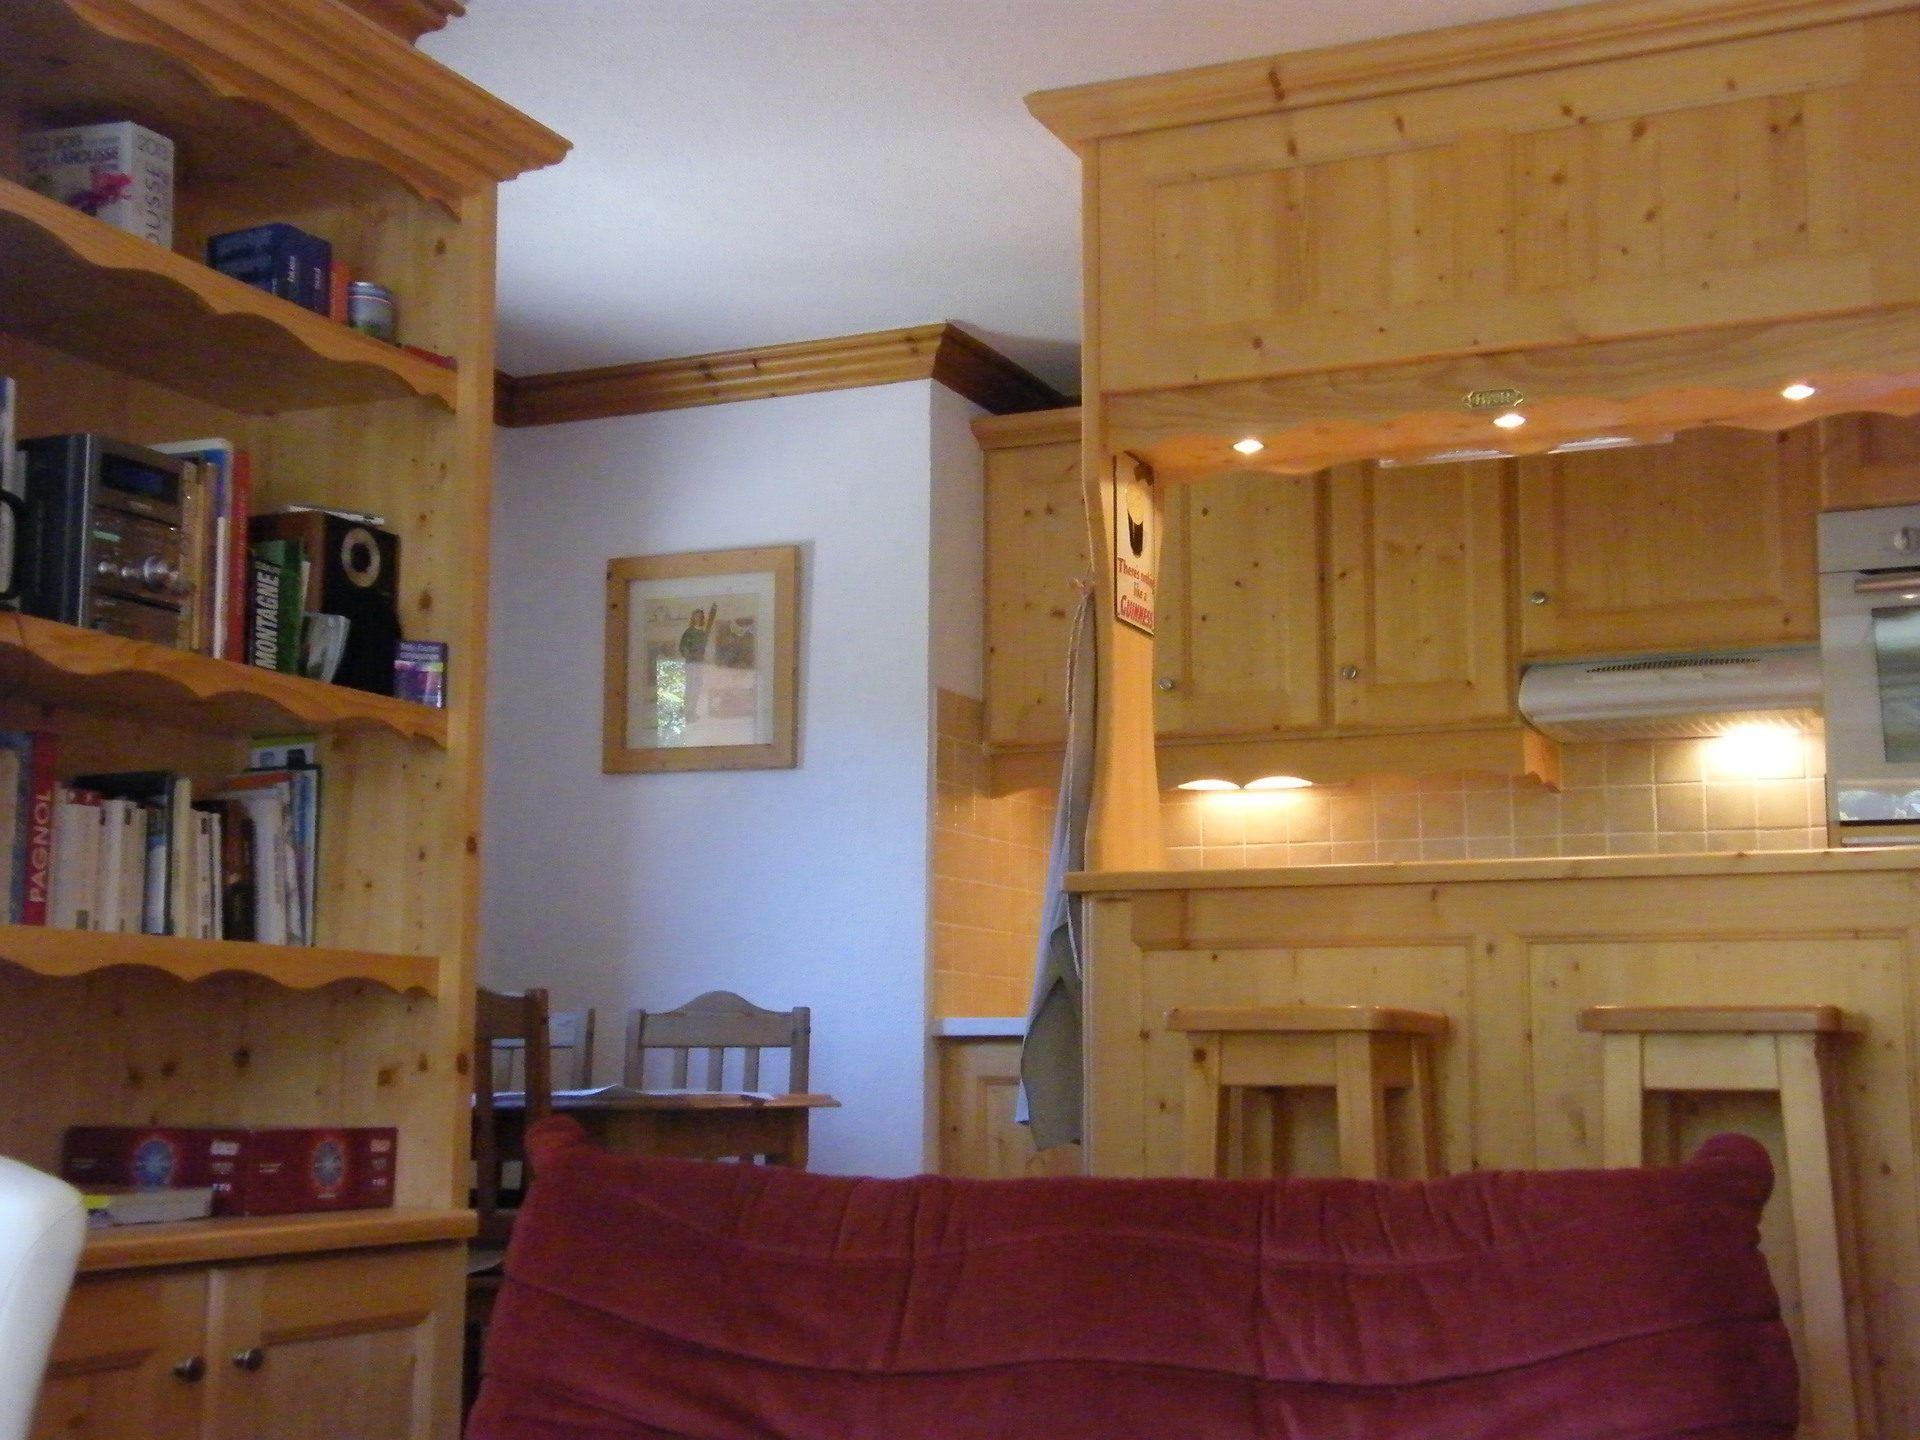 4 Rooms 6 Pers ski-in ski-out / BALCONS DE TOUGNETTE 7